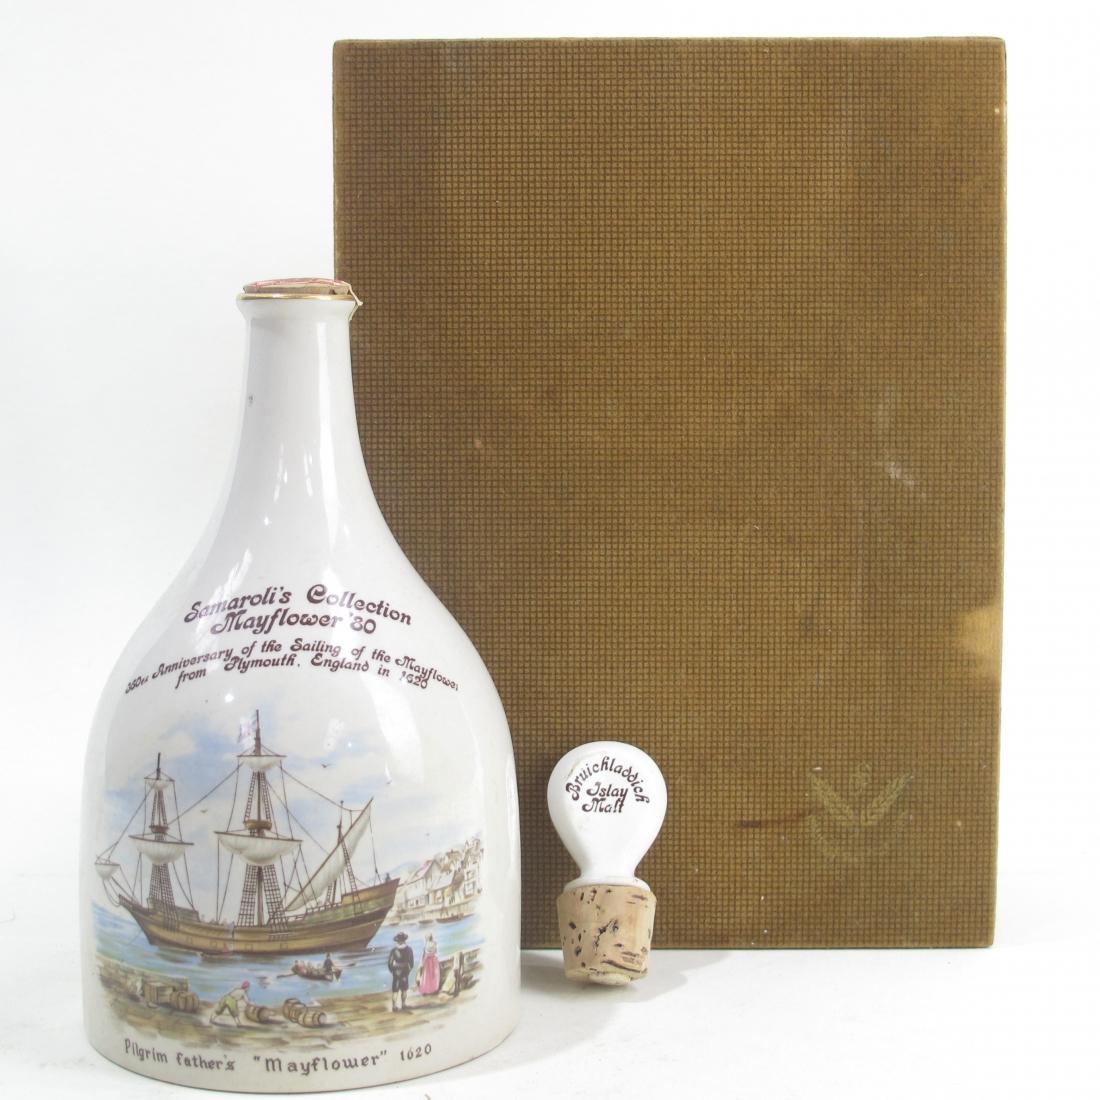 Bruichladdich 15 Year Old Samaroli's Collection / Mayflower '80